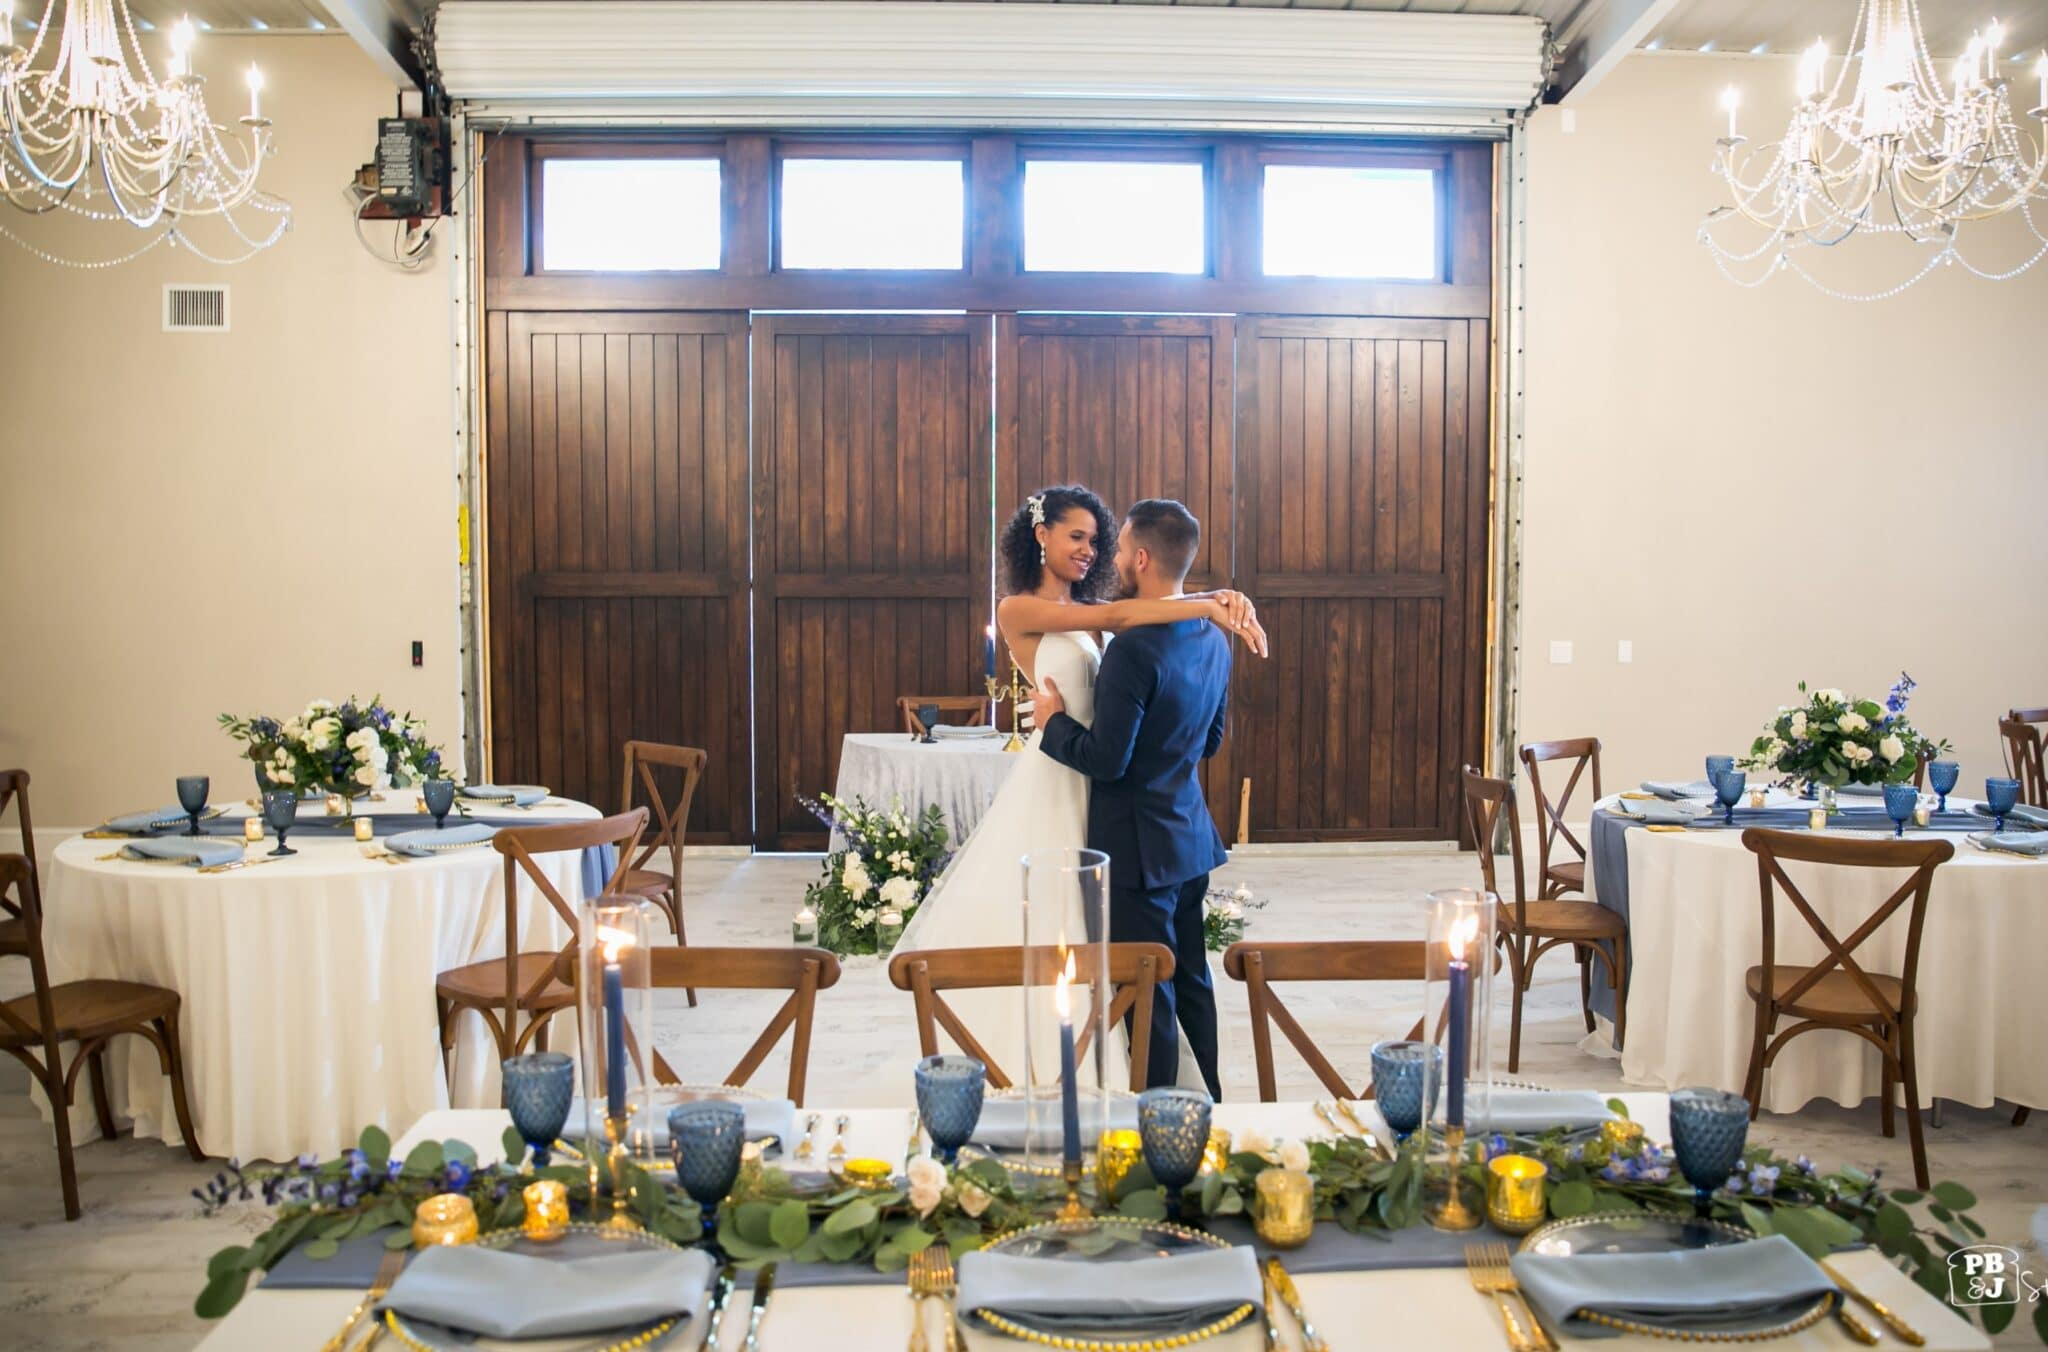 bride and groom dancing in barn below chandeliers